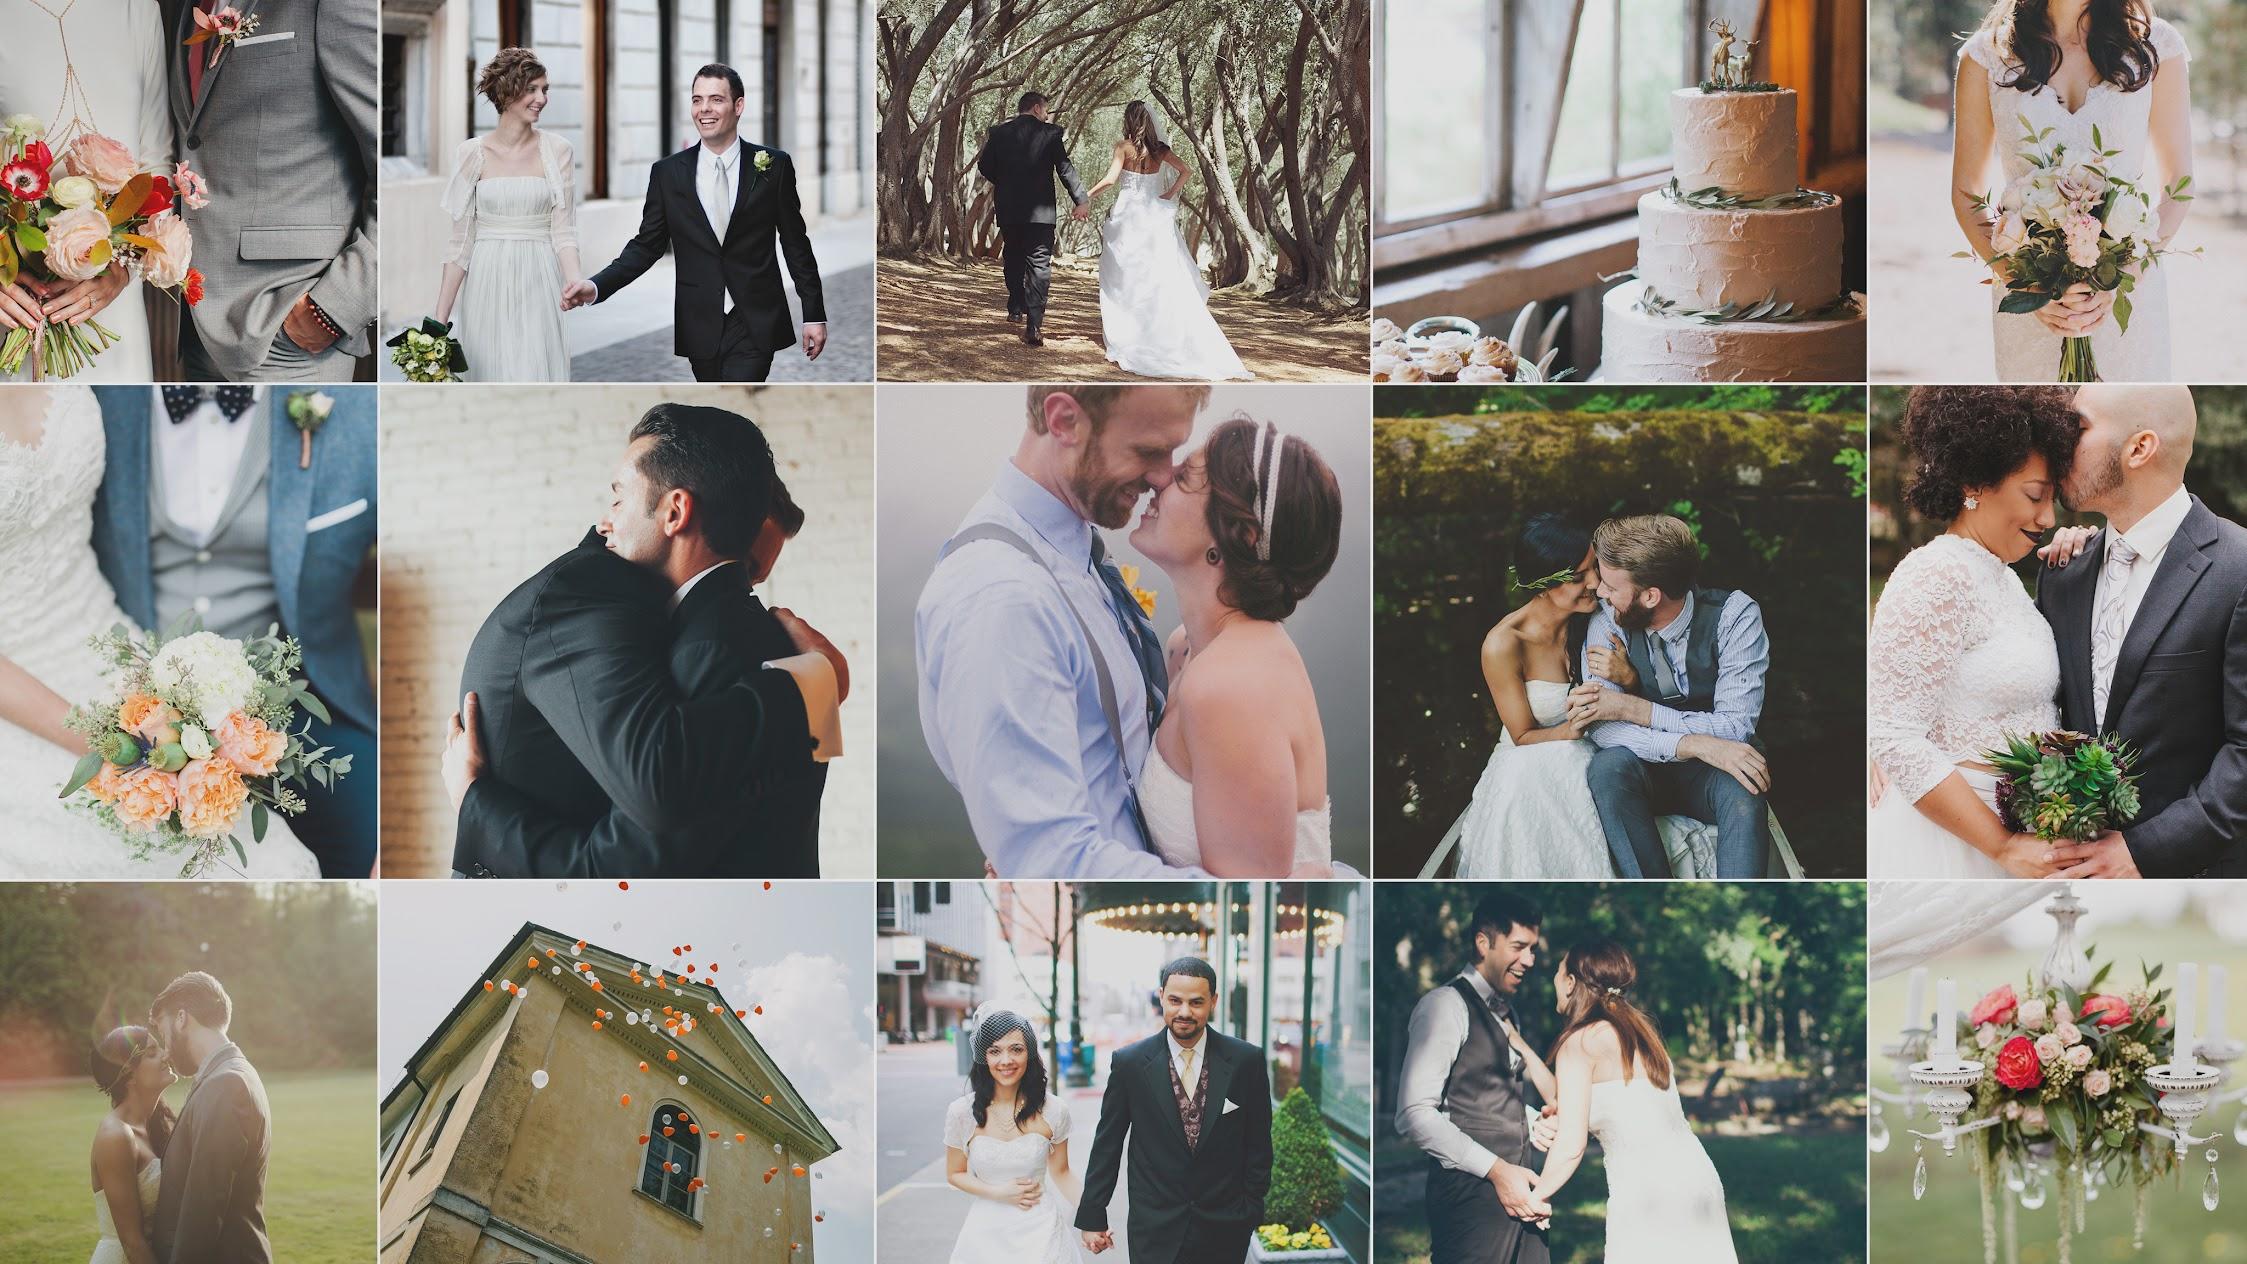 WeddingWire, Inc. - Apps on Google Play